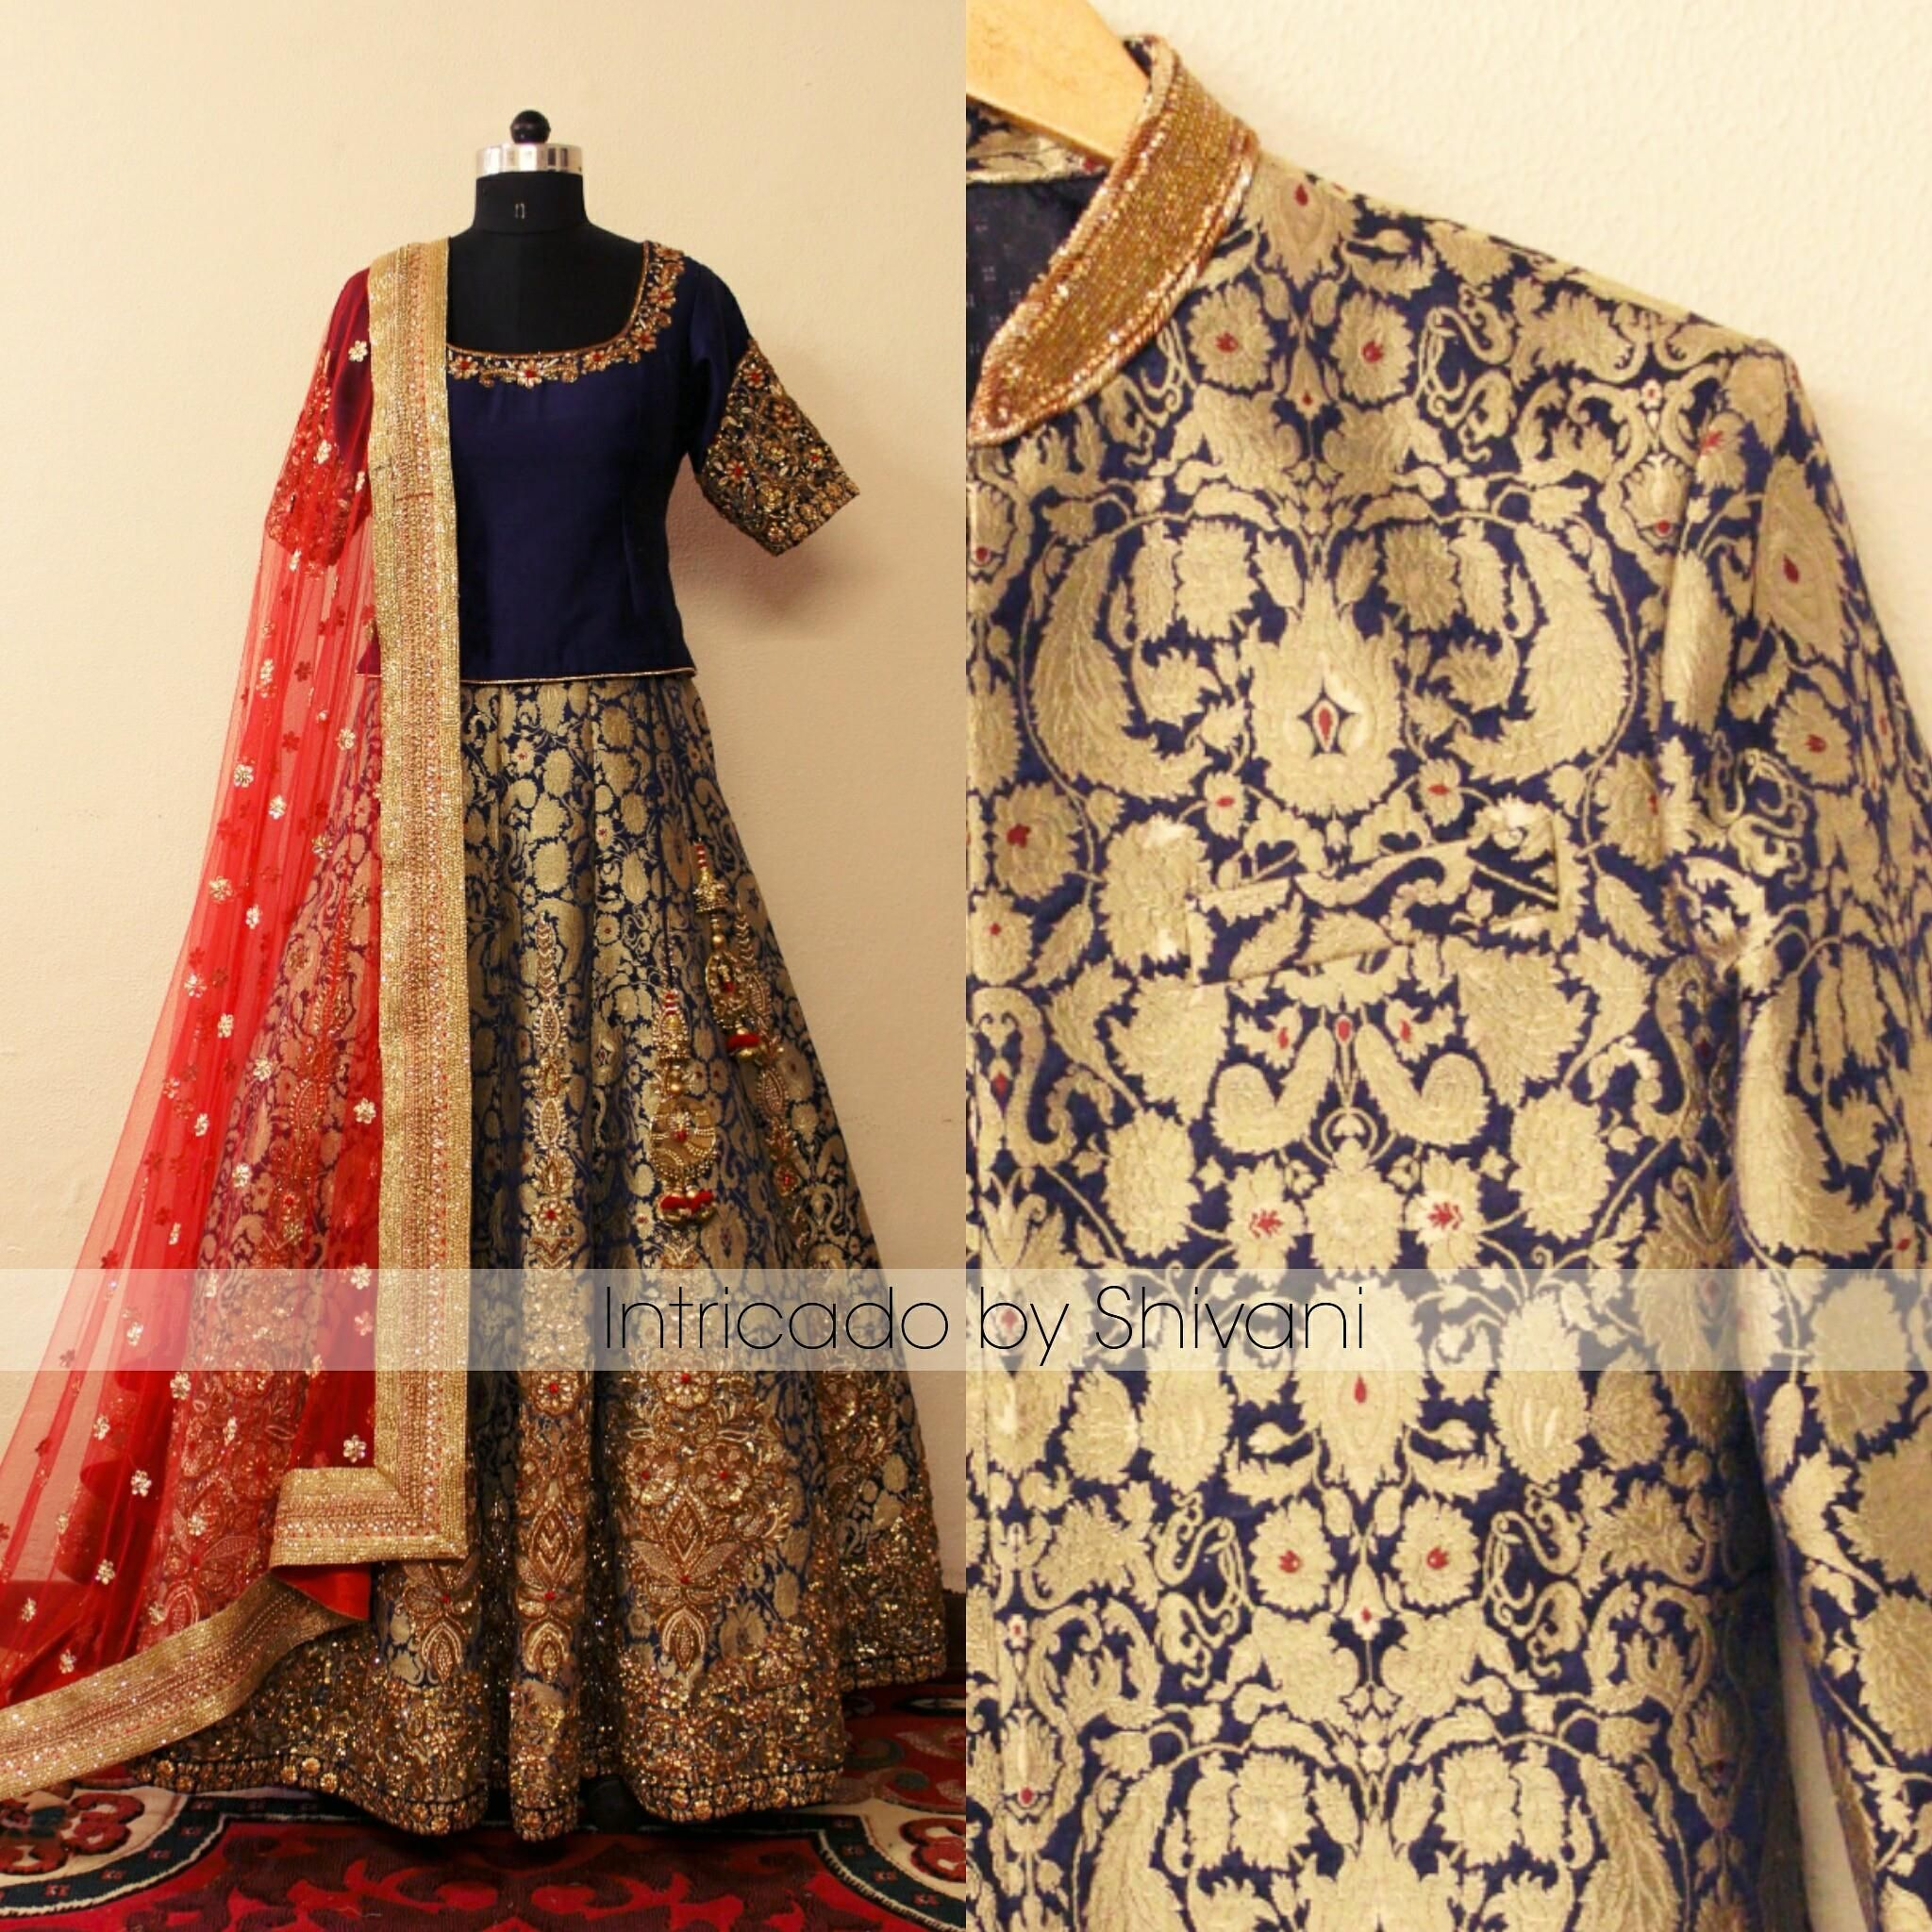 Zardozi  kundan   stone embroidered lehenga in pure Kimkhab fabric and a matching sherwani for the groom. To customize/order/enquiry  Email at shivani@intricado.com  Whatsapp:- +91 8527463626